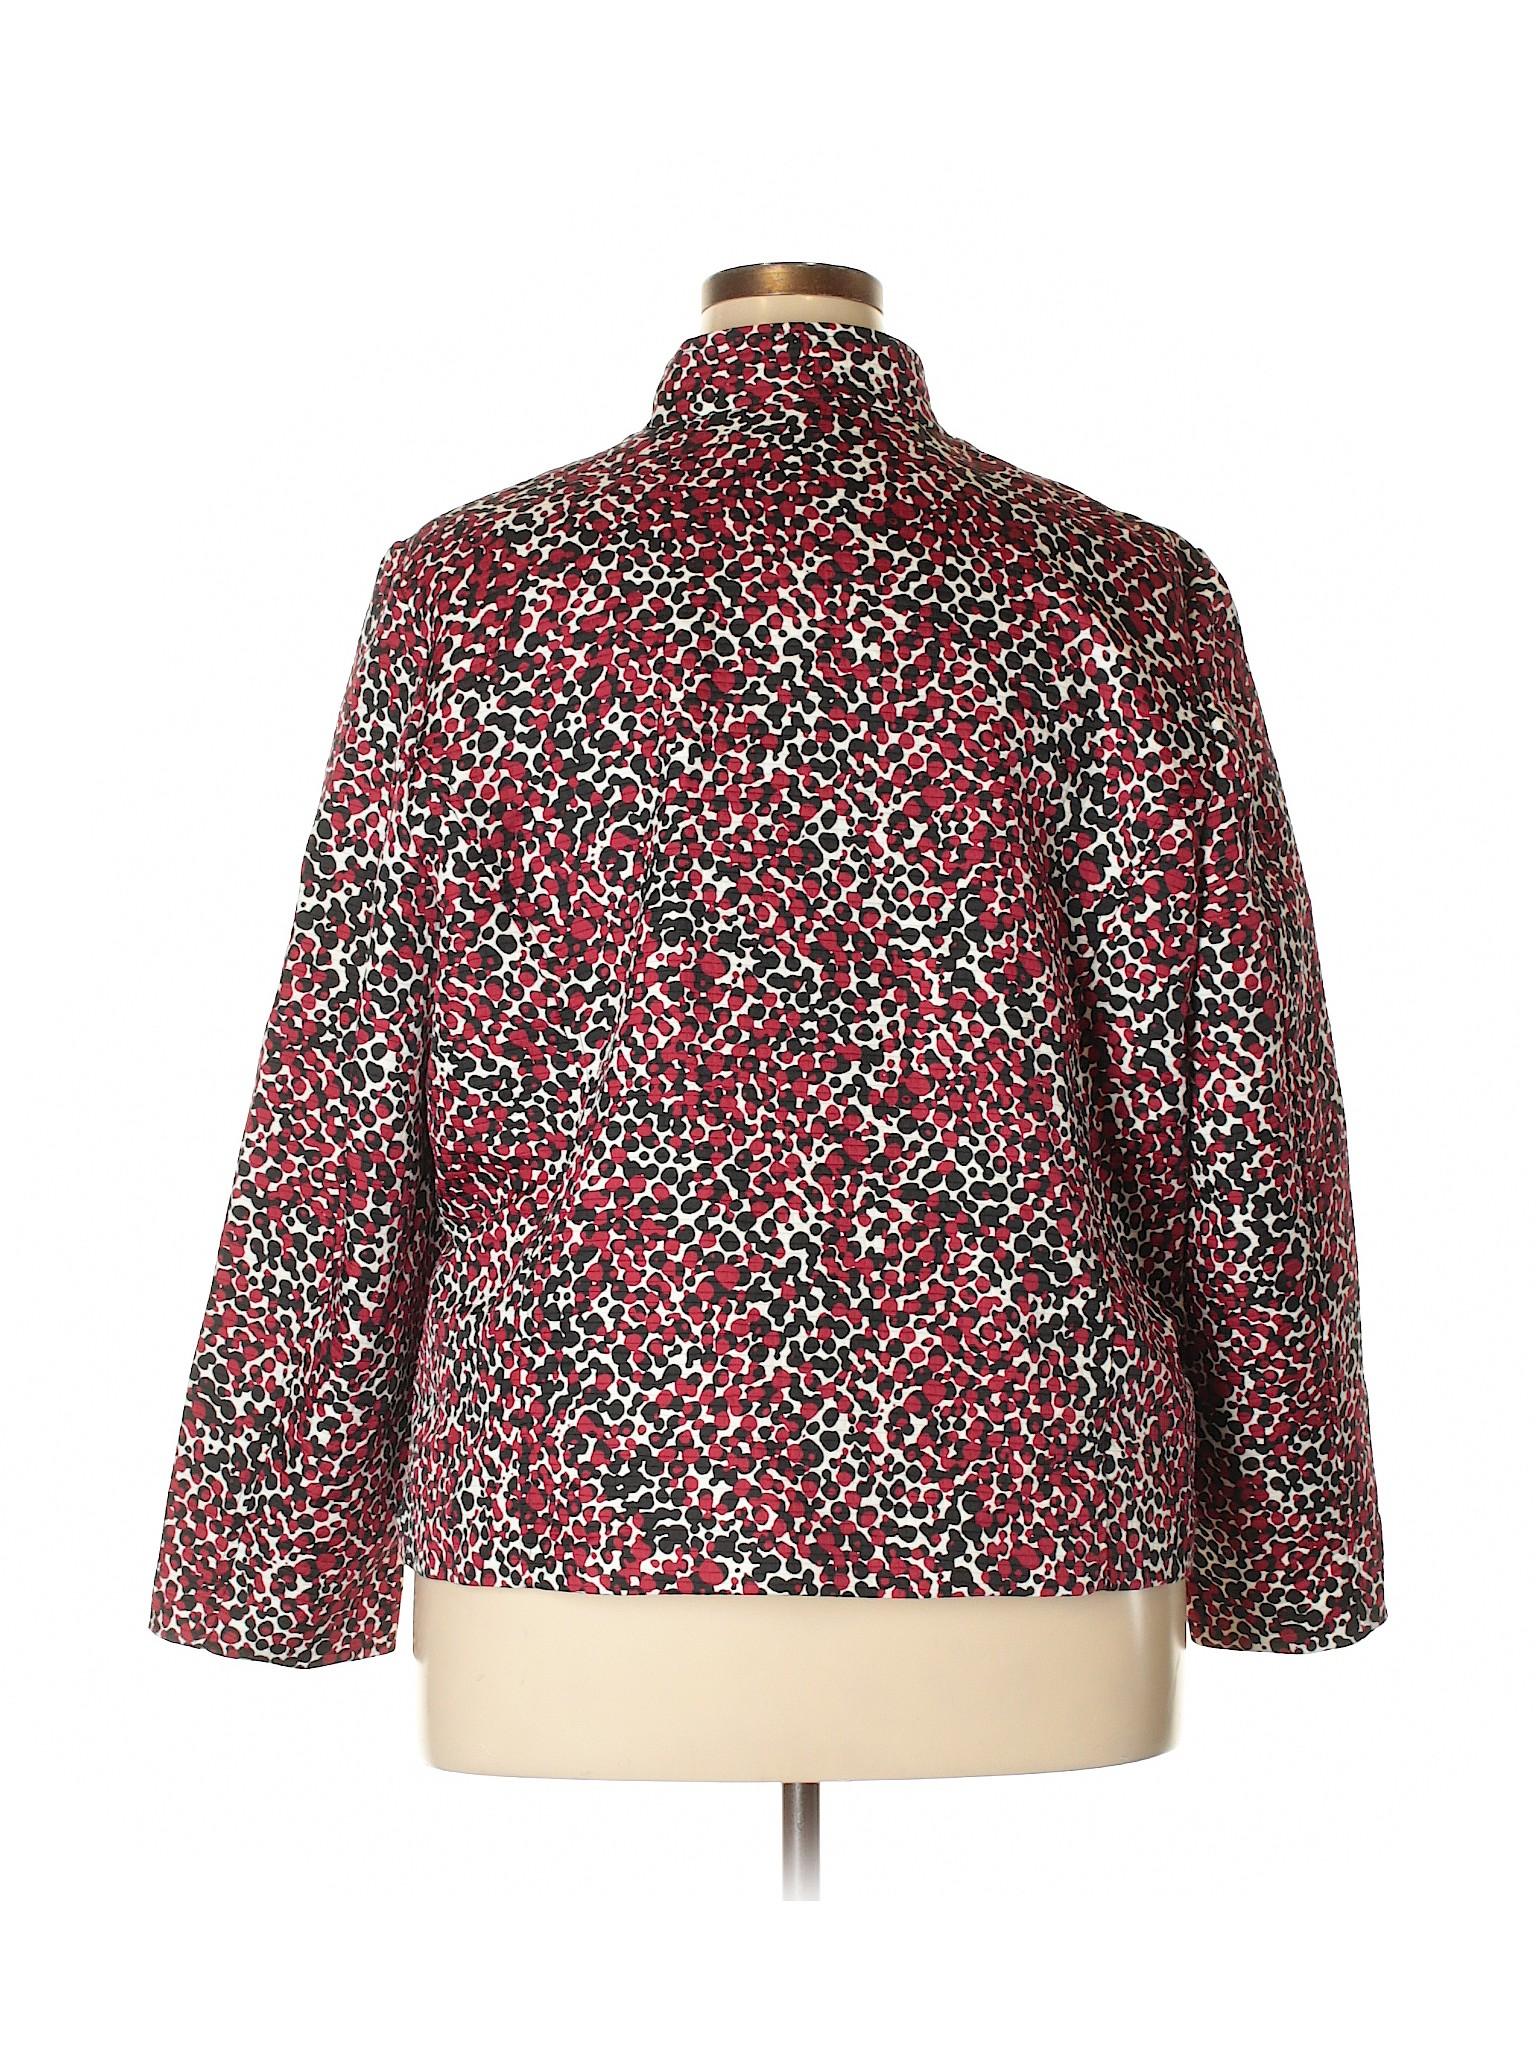 leisure Preswick amp; Jacket Moore Boutique zqvwH4v